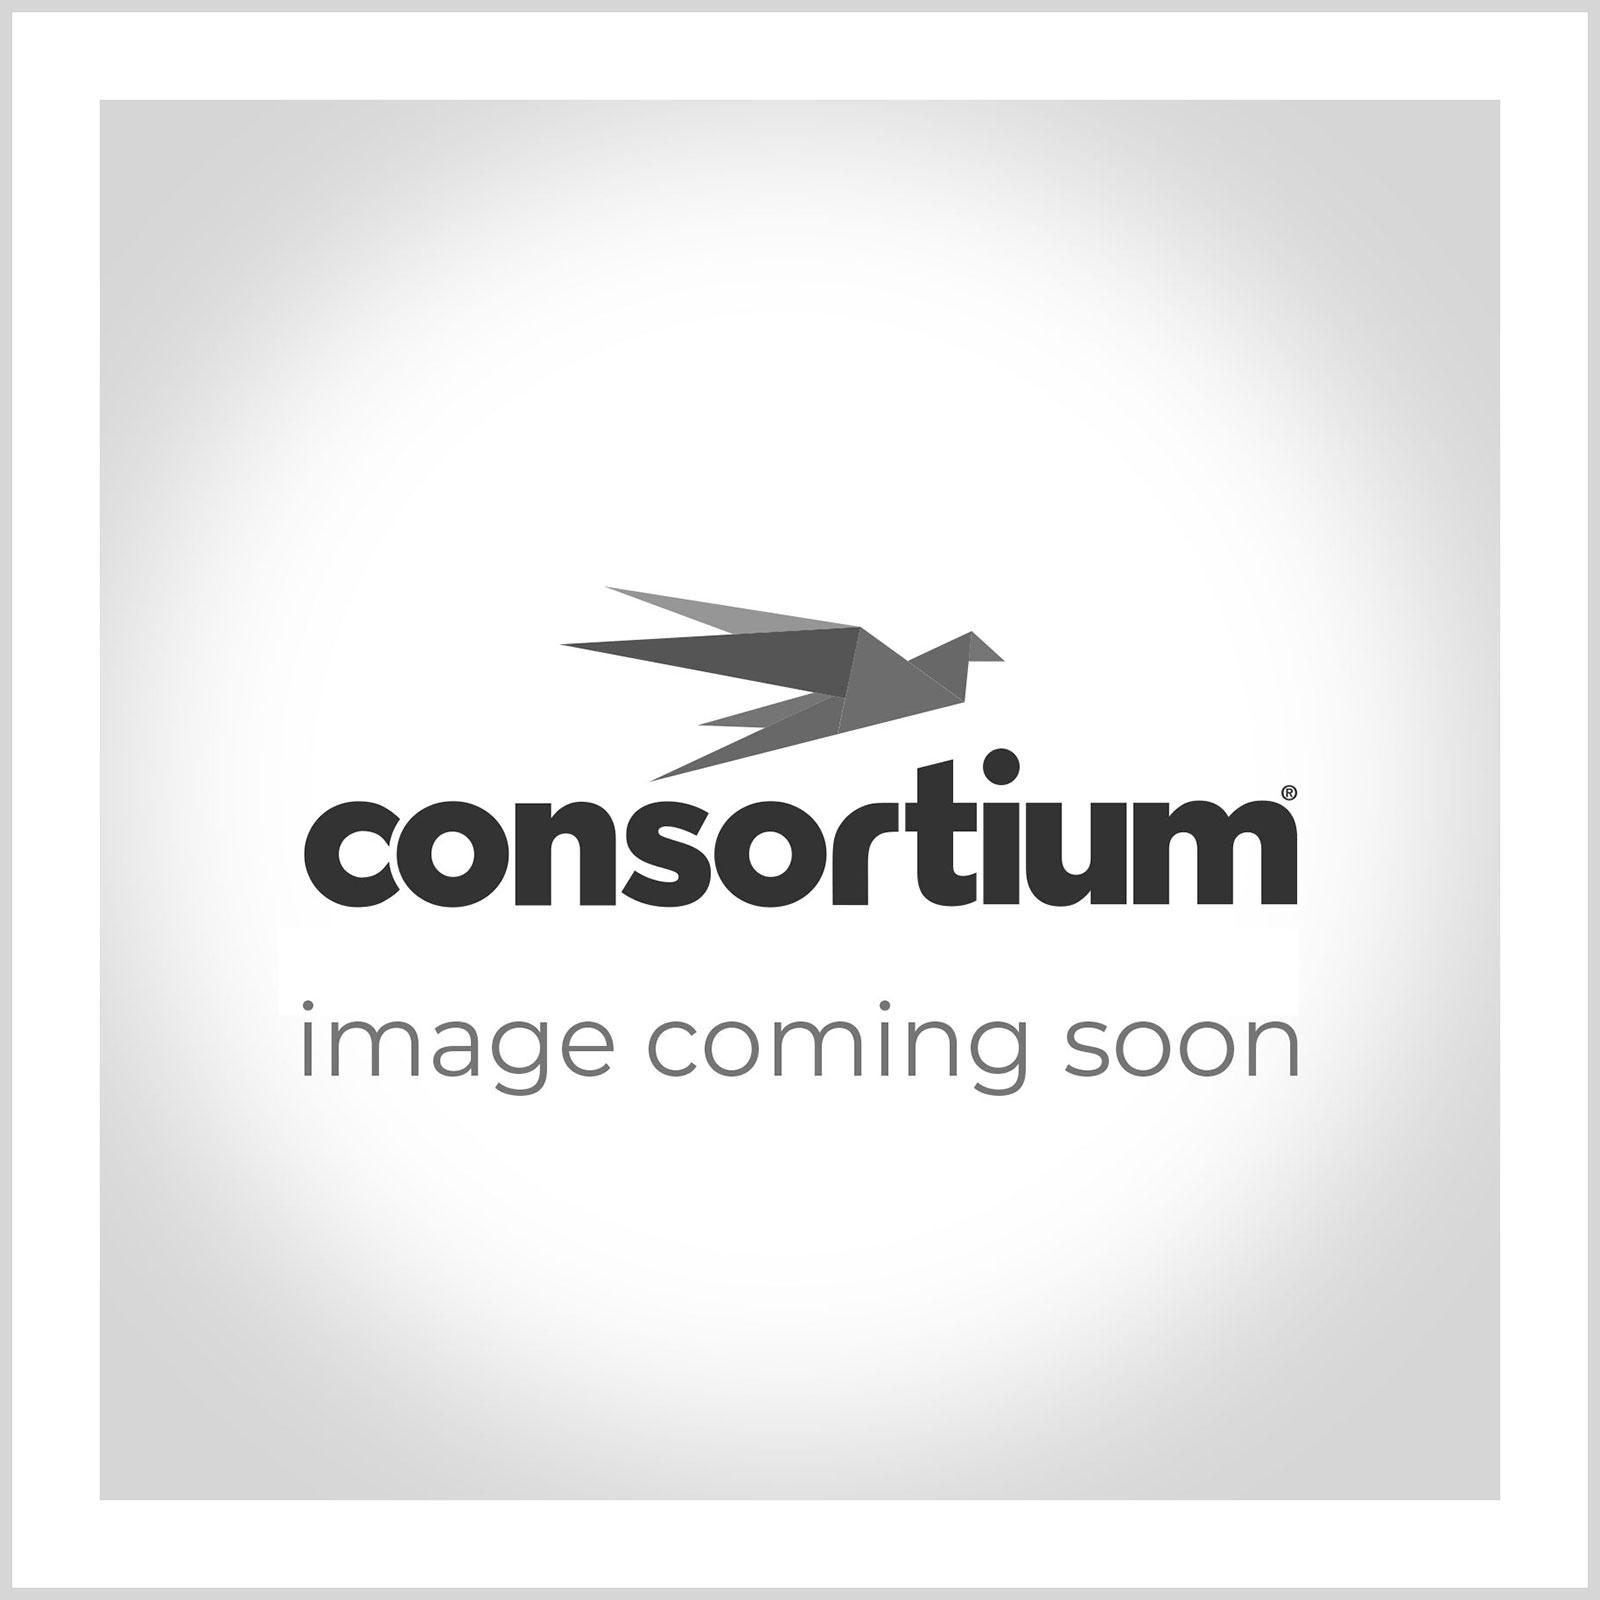 SYR® Interchange Flat Mopping Frame